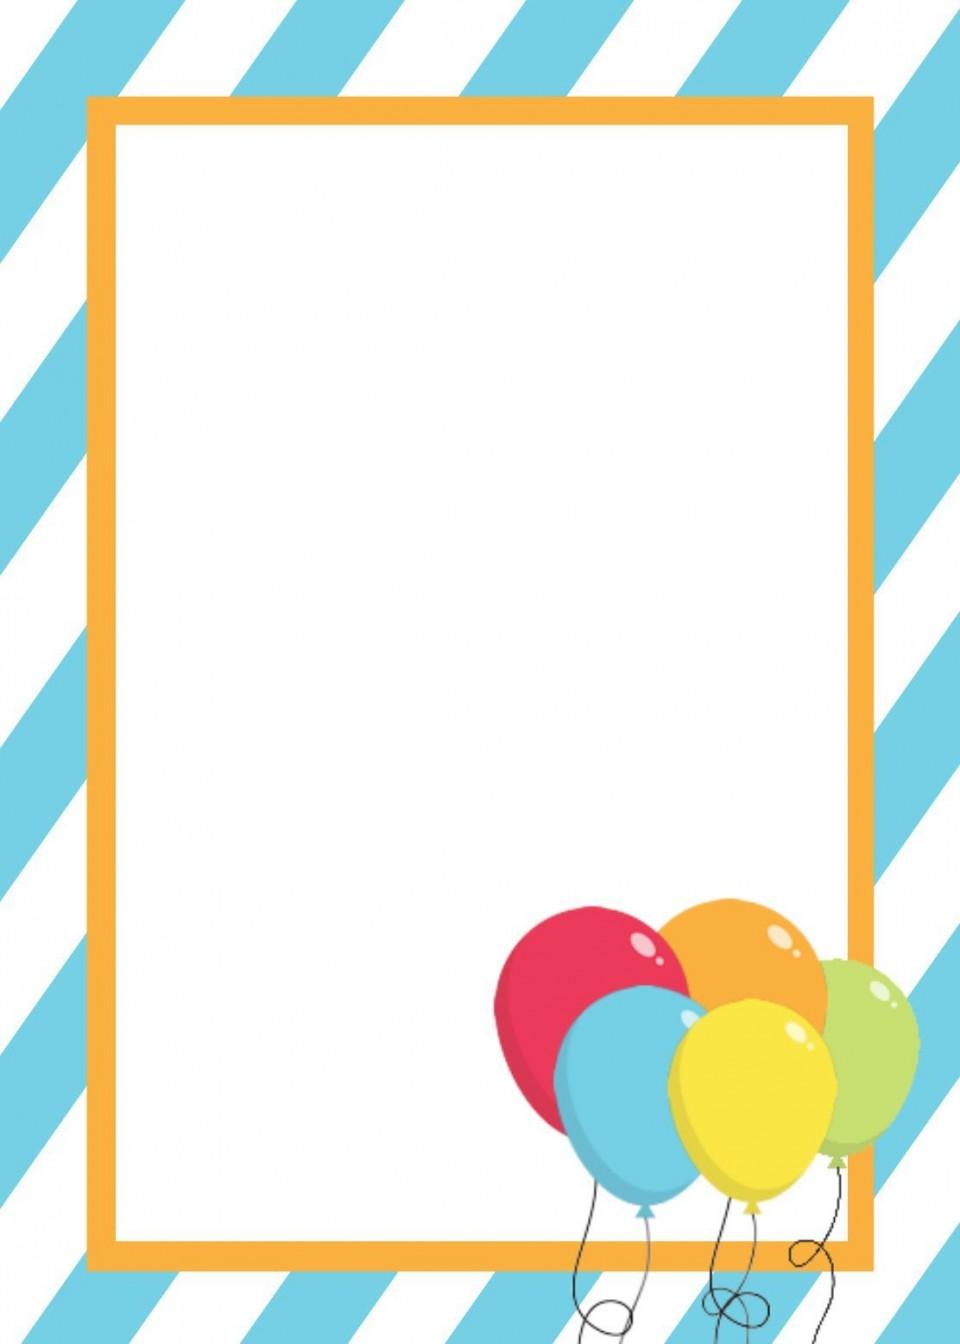 002 Staggering Microsoft Word Birthday Invitation Template Inspiration  Editable 50th 60th960